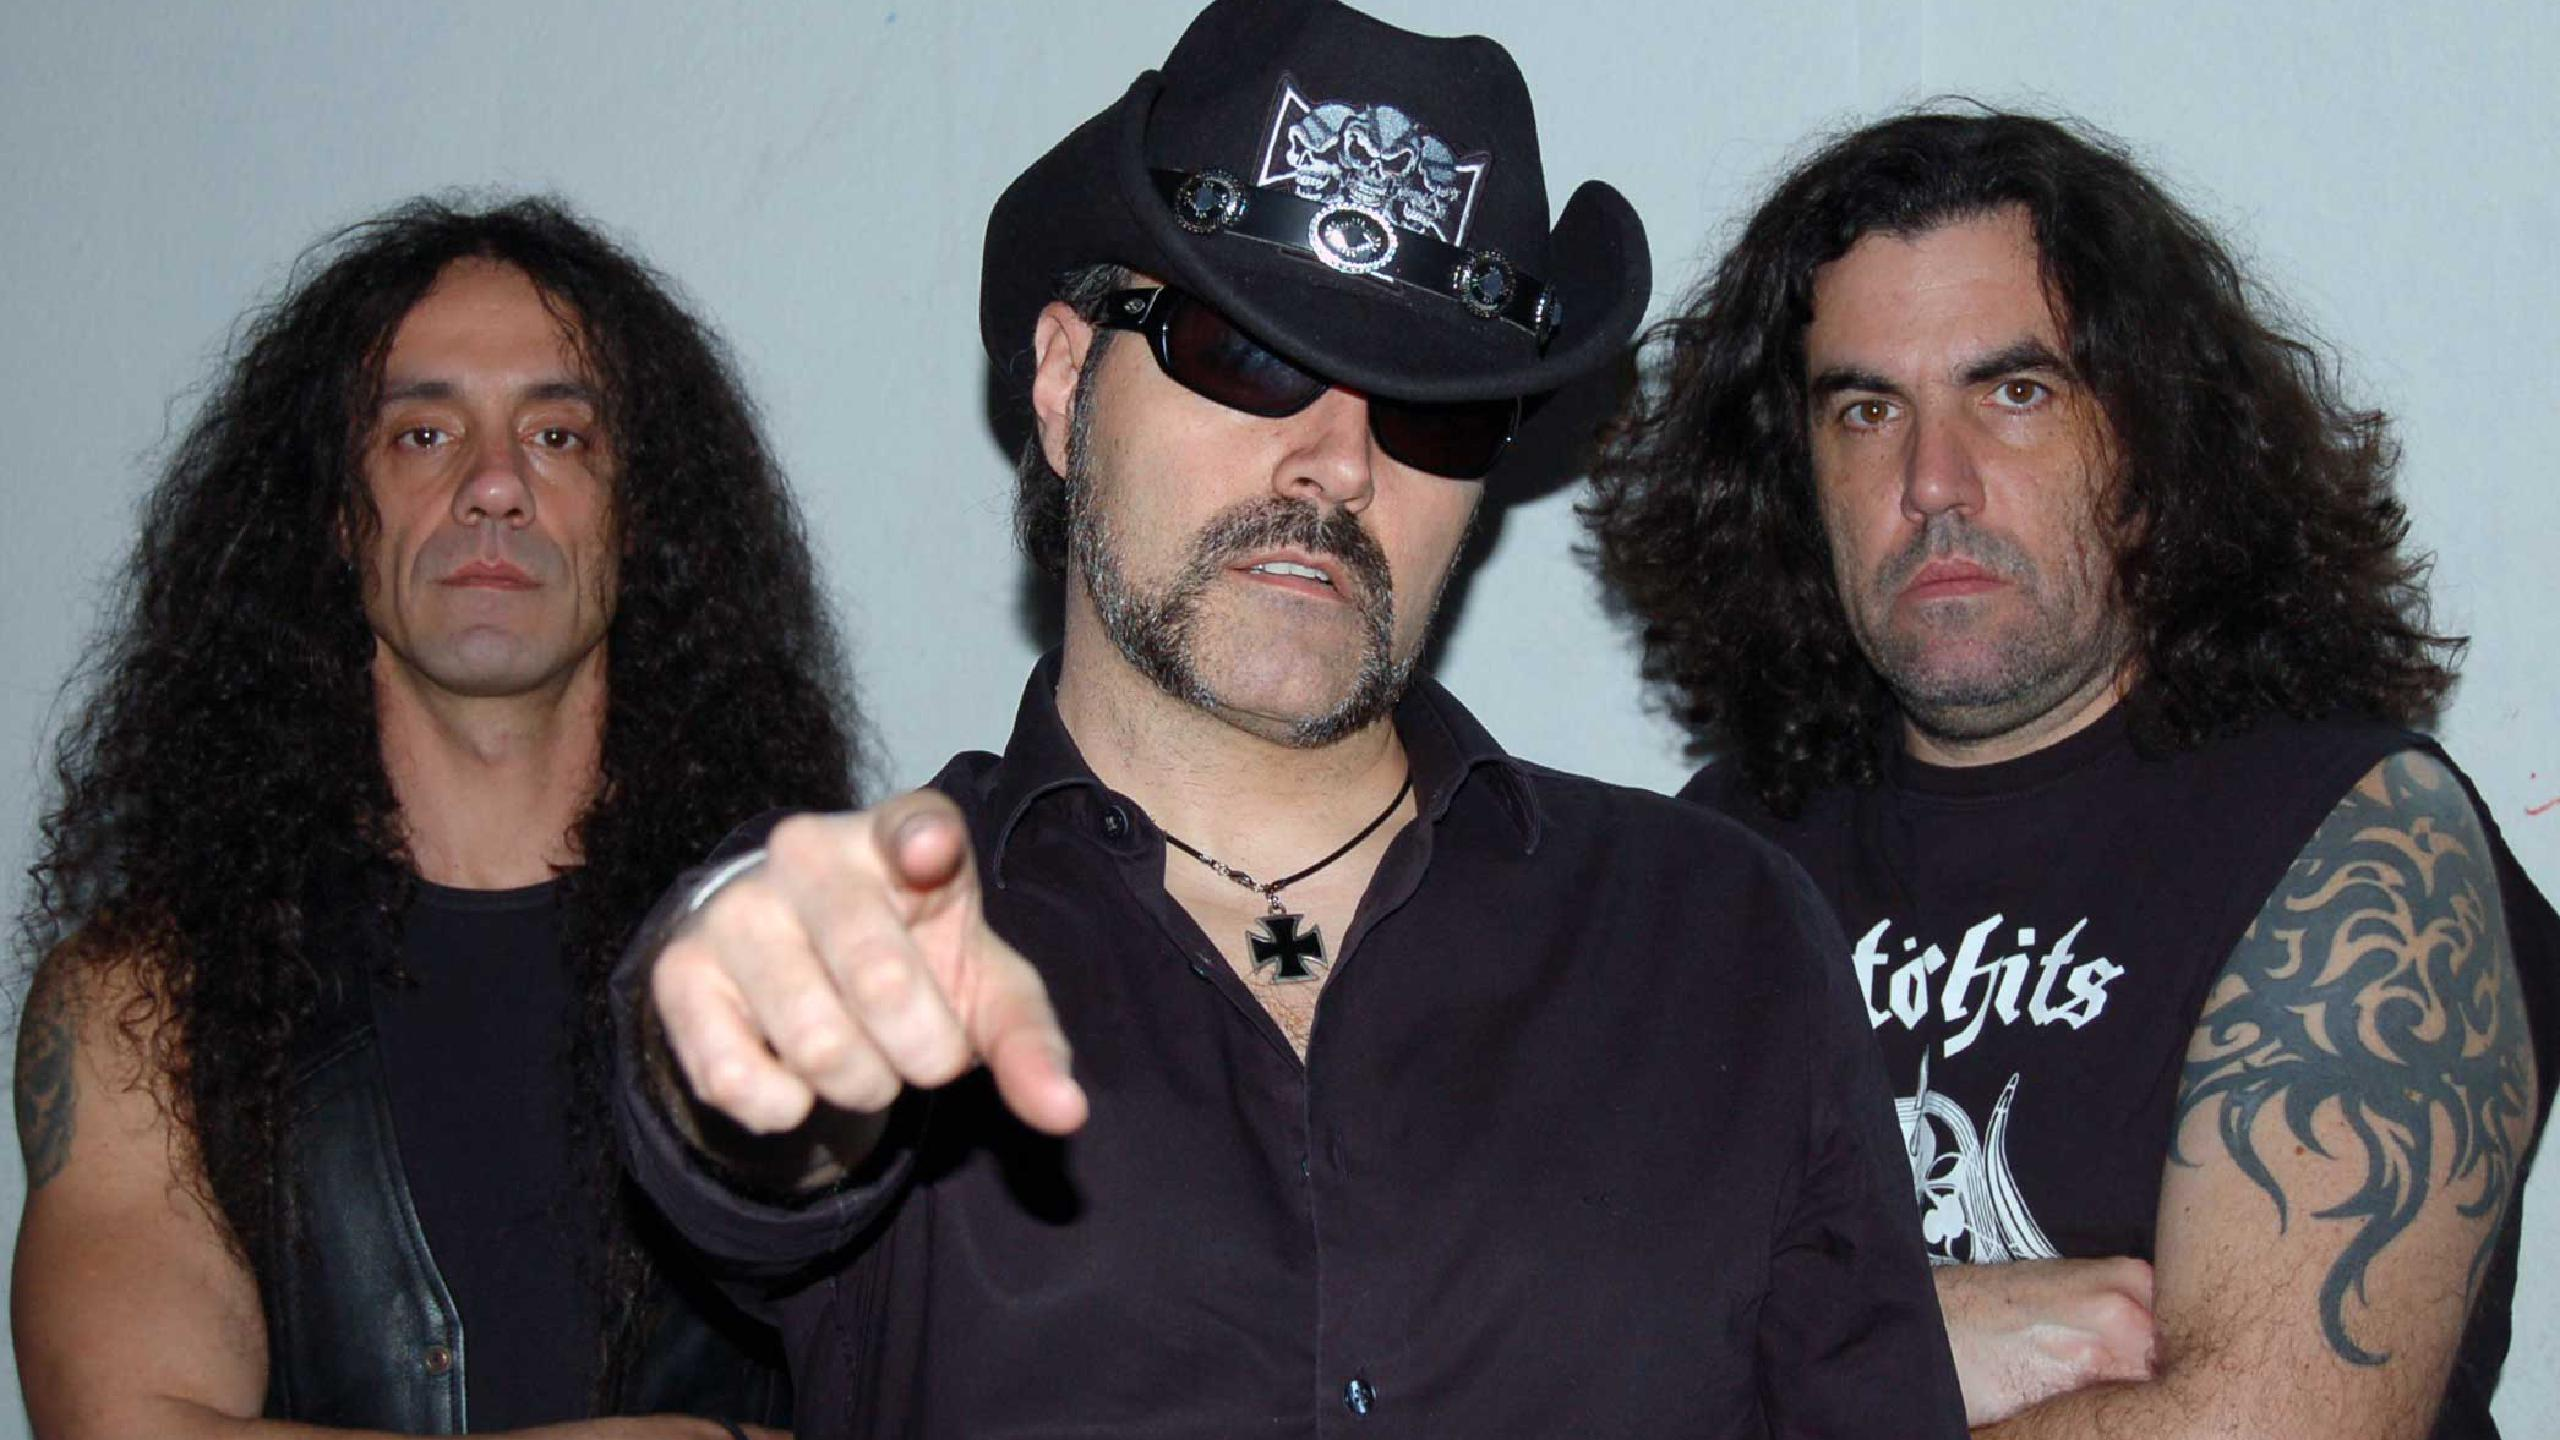 Motörhits tributo a Motörhead en Ponferrada 1